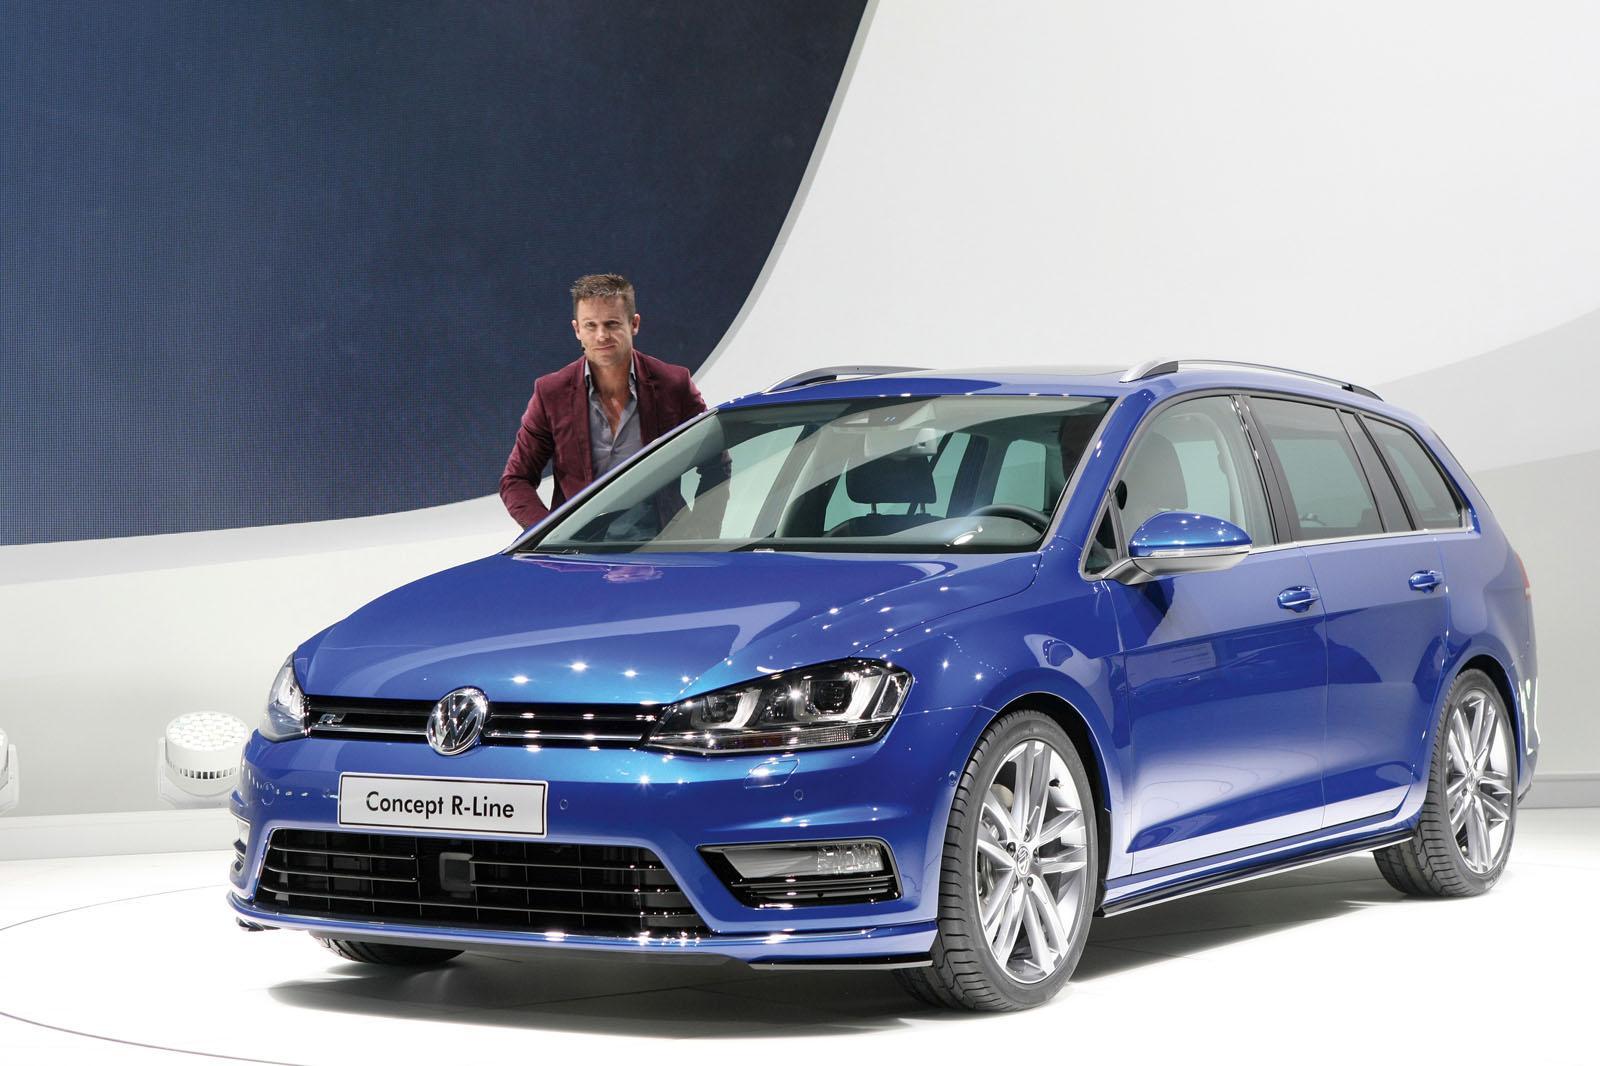 Volkswagen Cars News Mk7 Golf Wagon R Line Concept